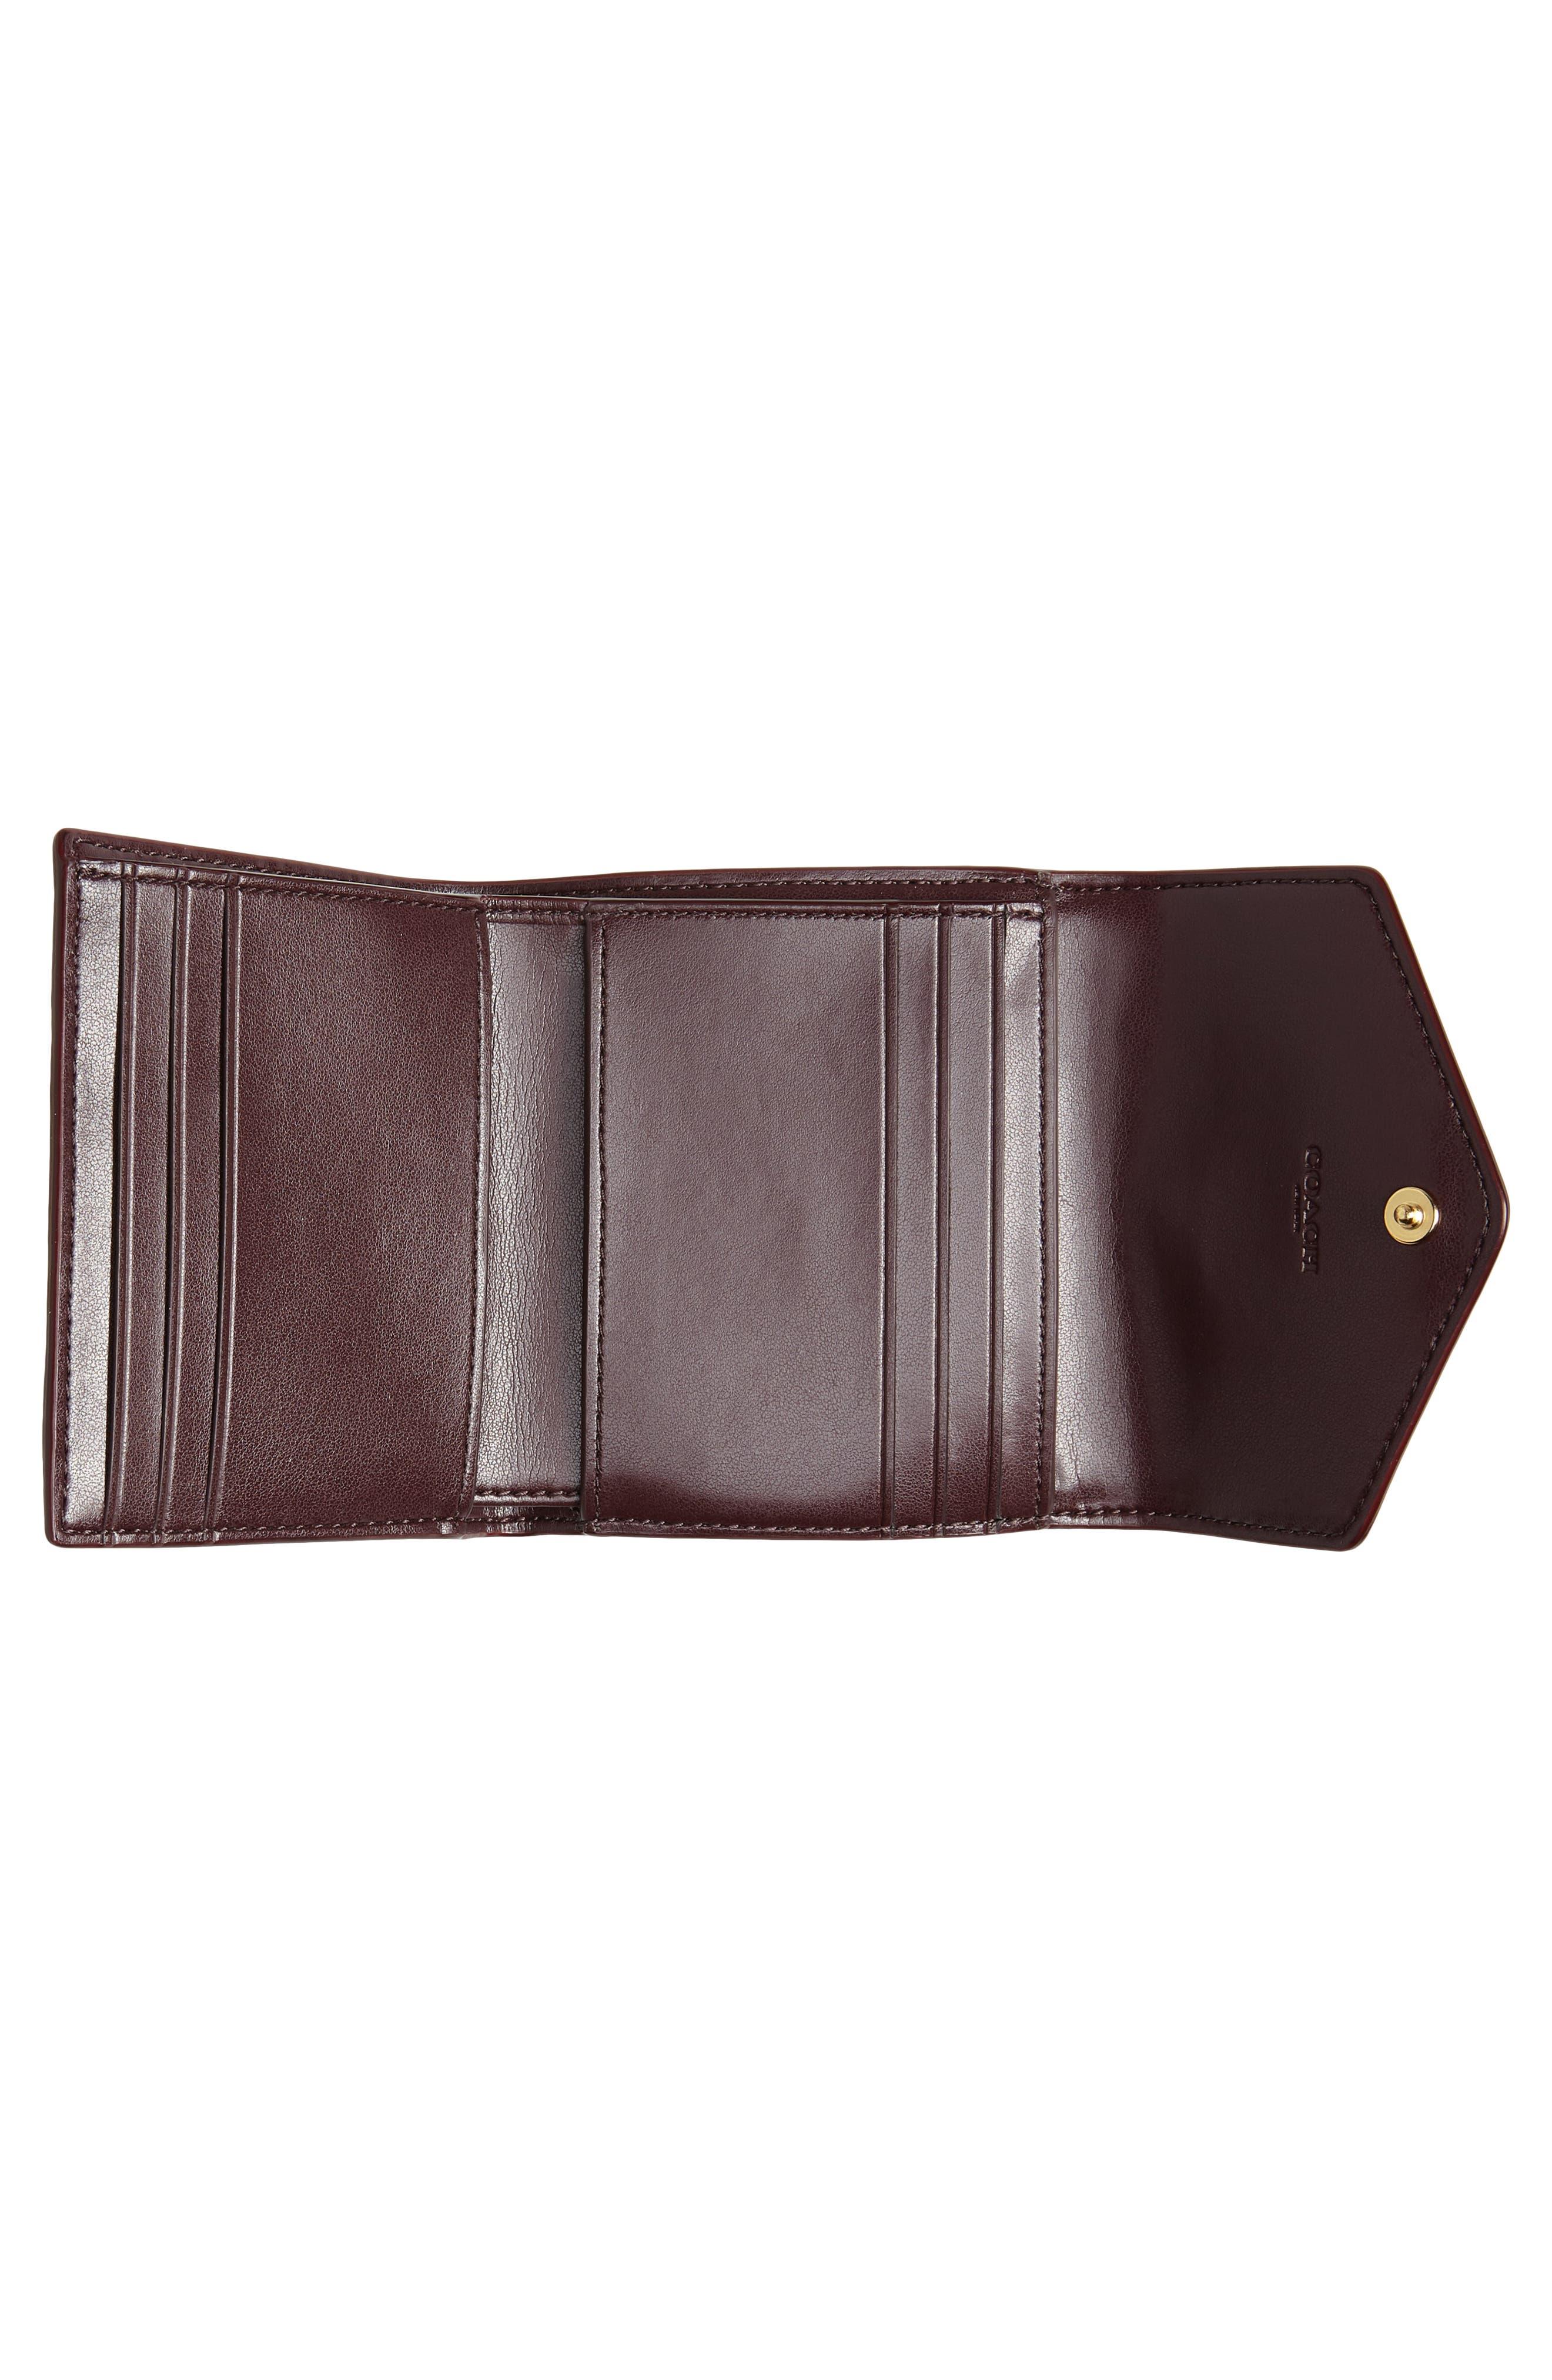 COACH, Colorblock Coated Canvas & Leather Flap Wallet, Alternate thumbnail 2, color, 201